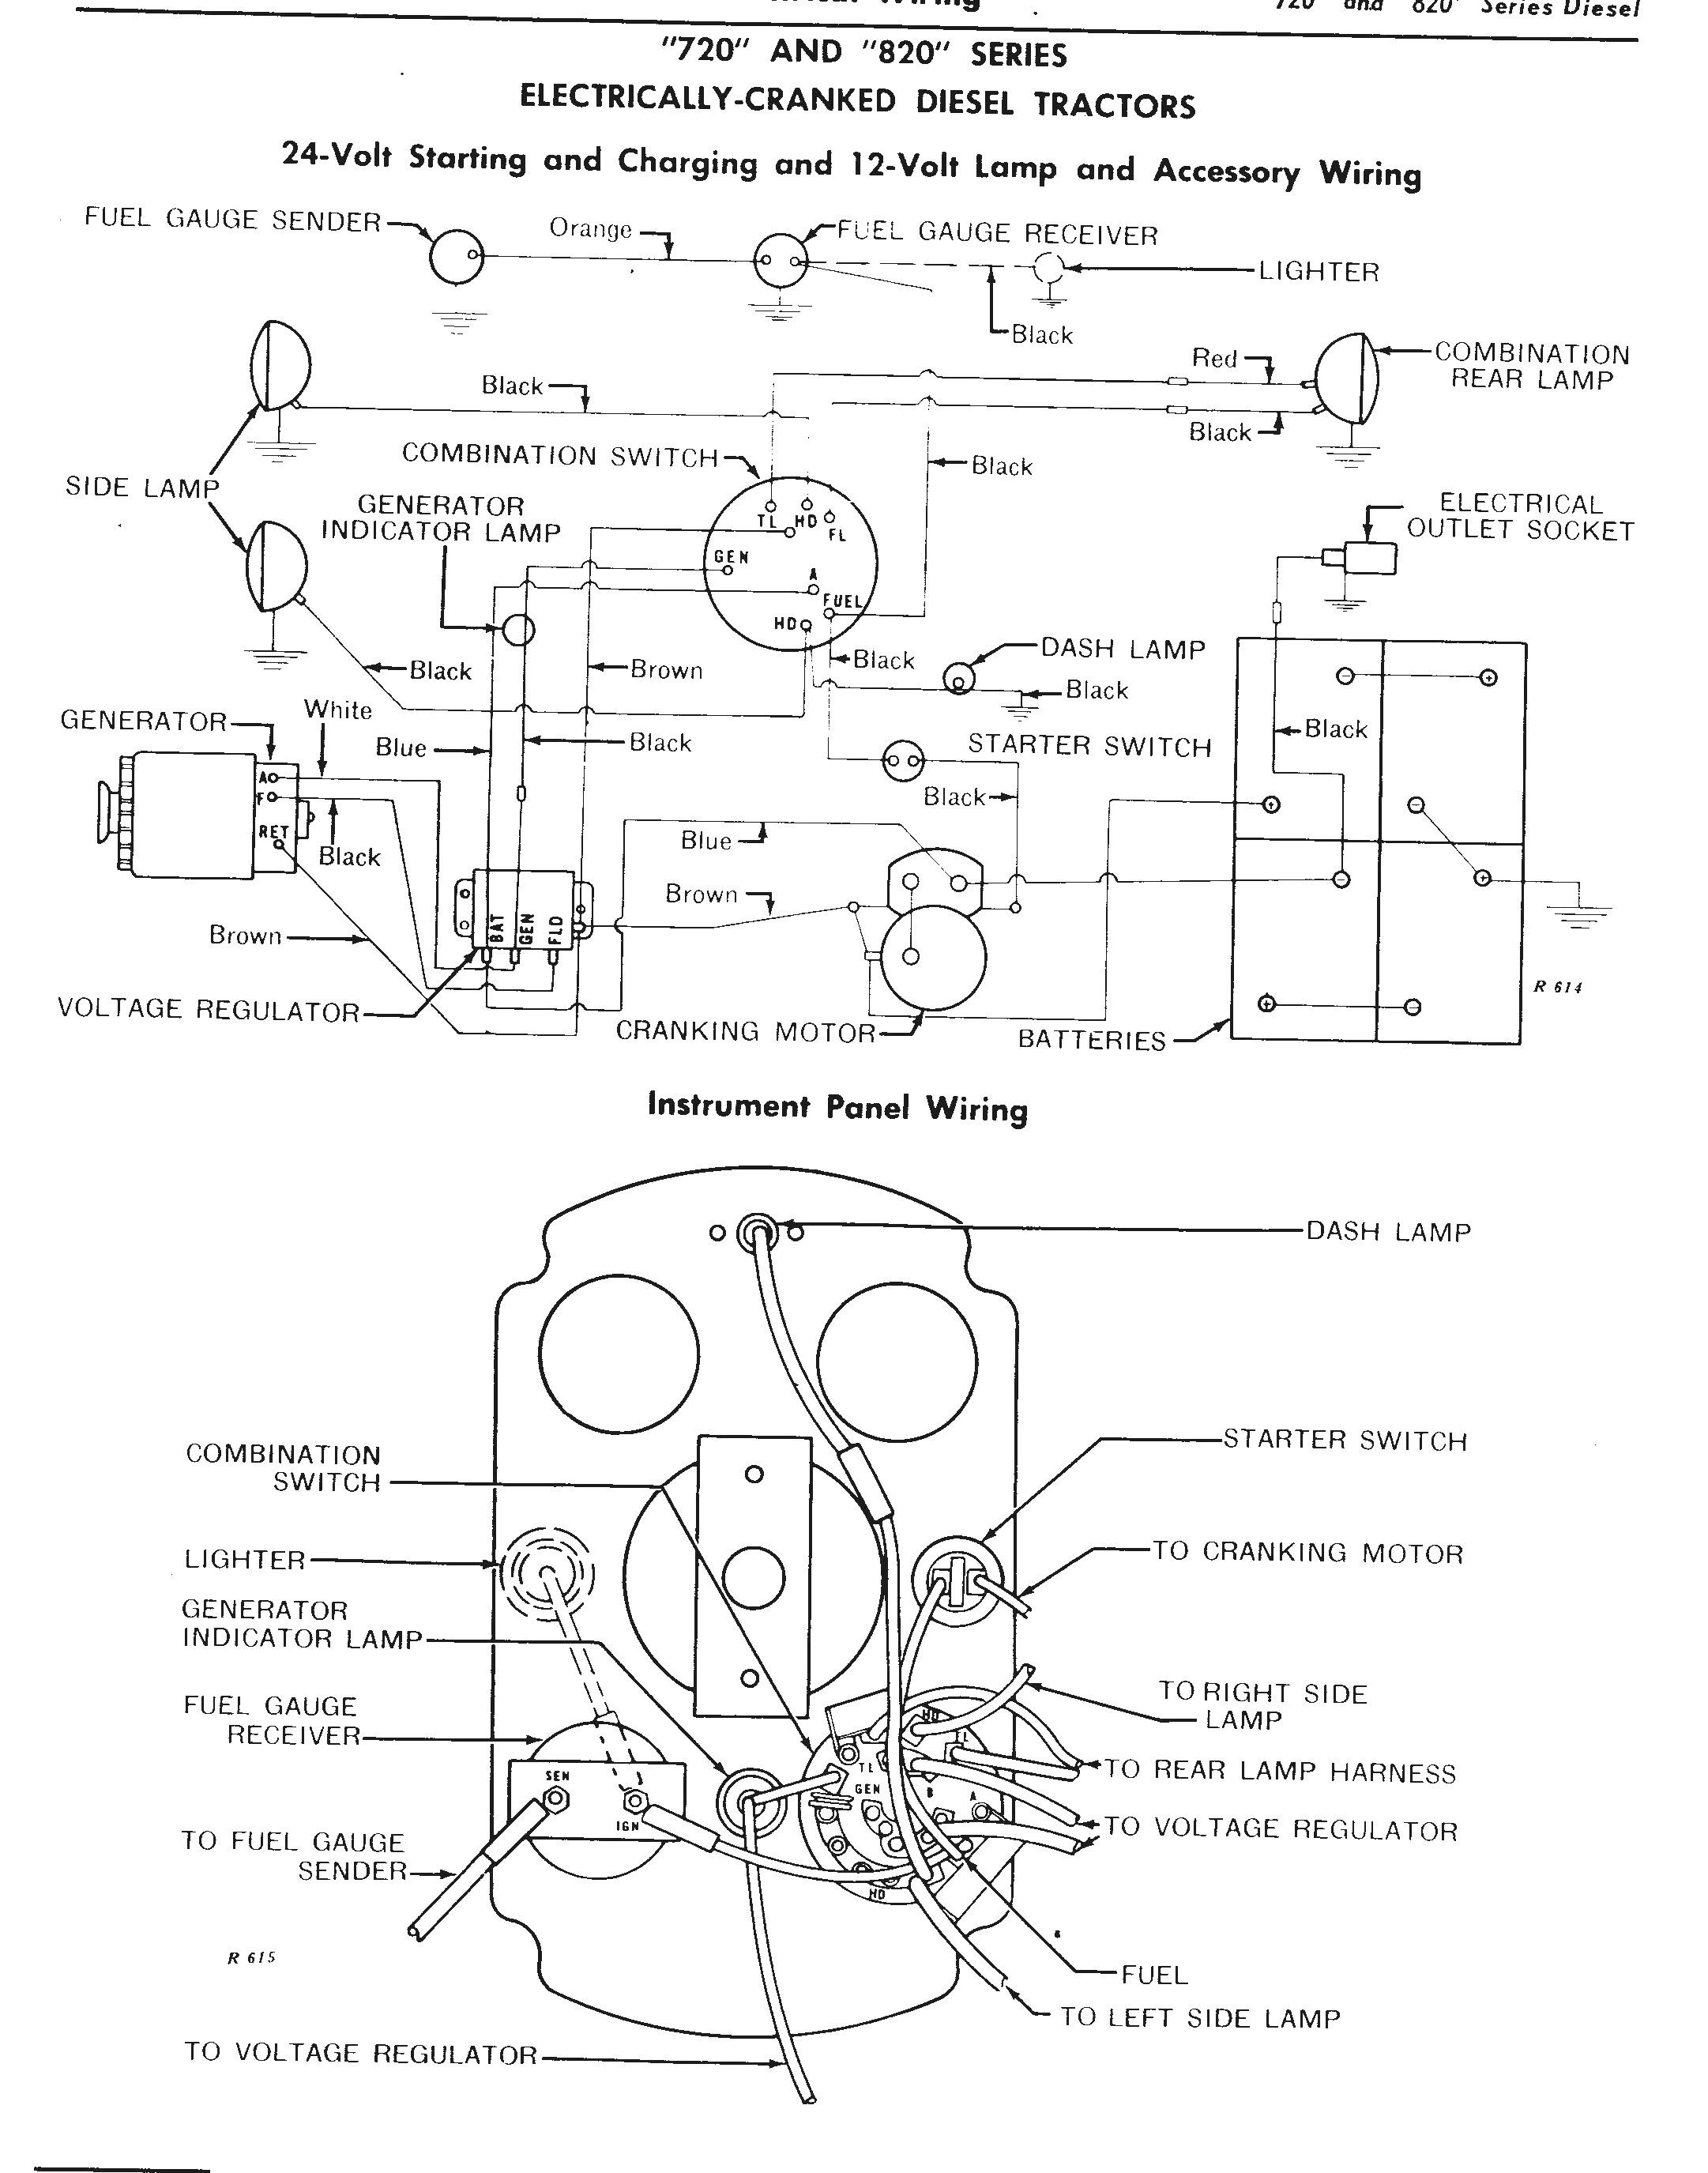 Diagram John Deere 4010 24v Wiring Diagram Full Version Hd Quality Wiring Diagram Ncwiring Tempocreativo It